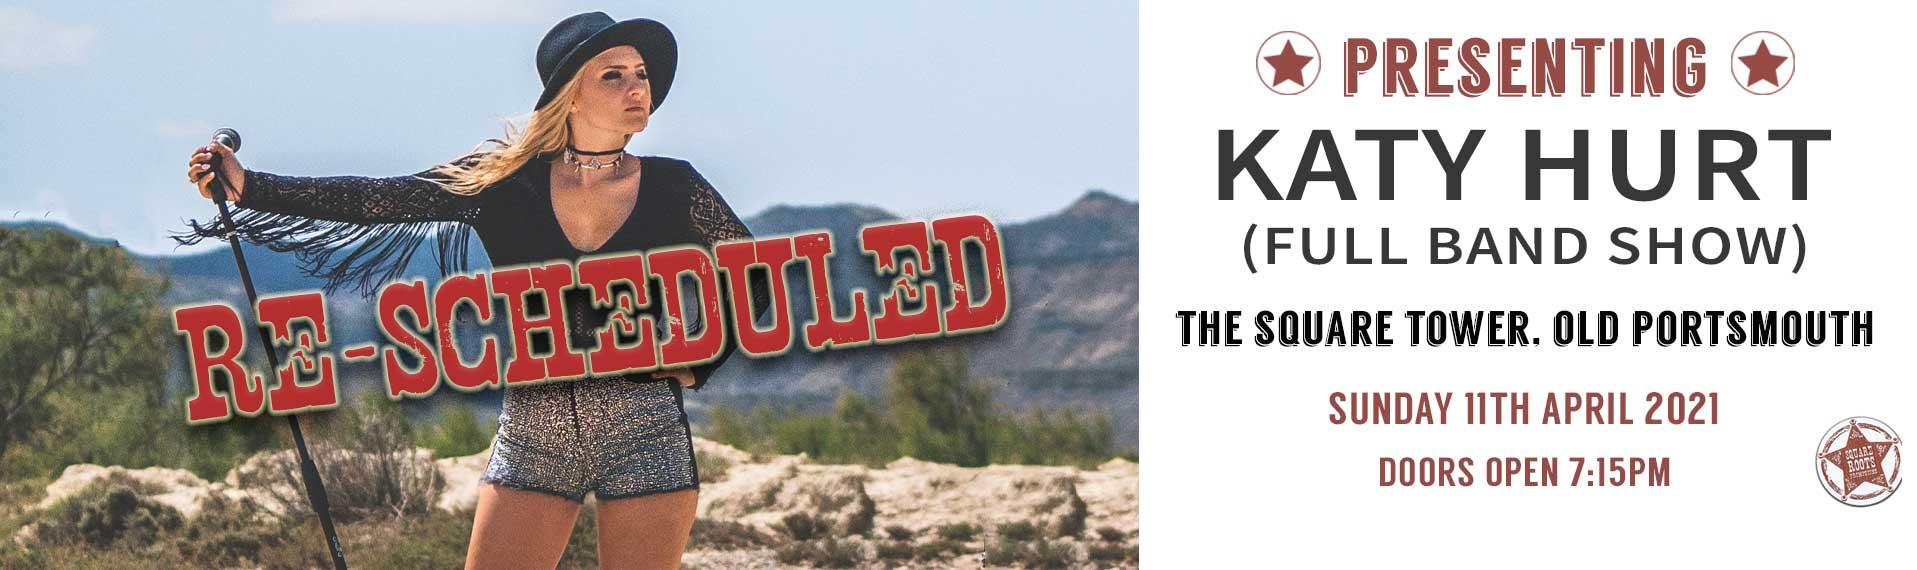 katy-hurt-banner-RESCHEDULED